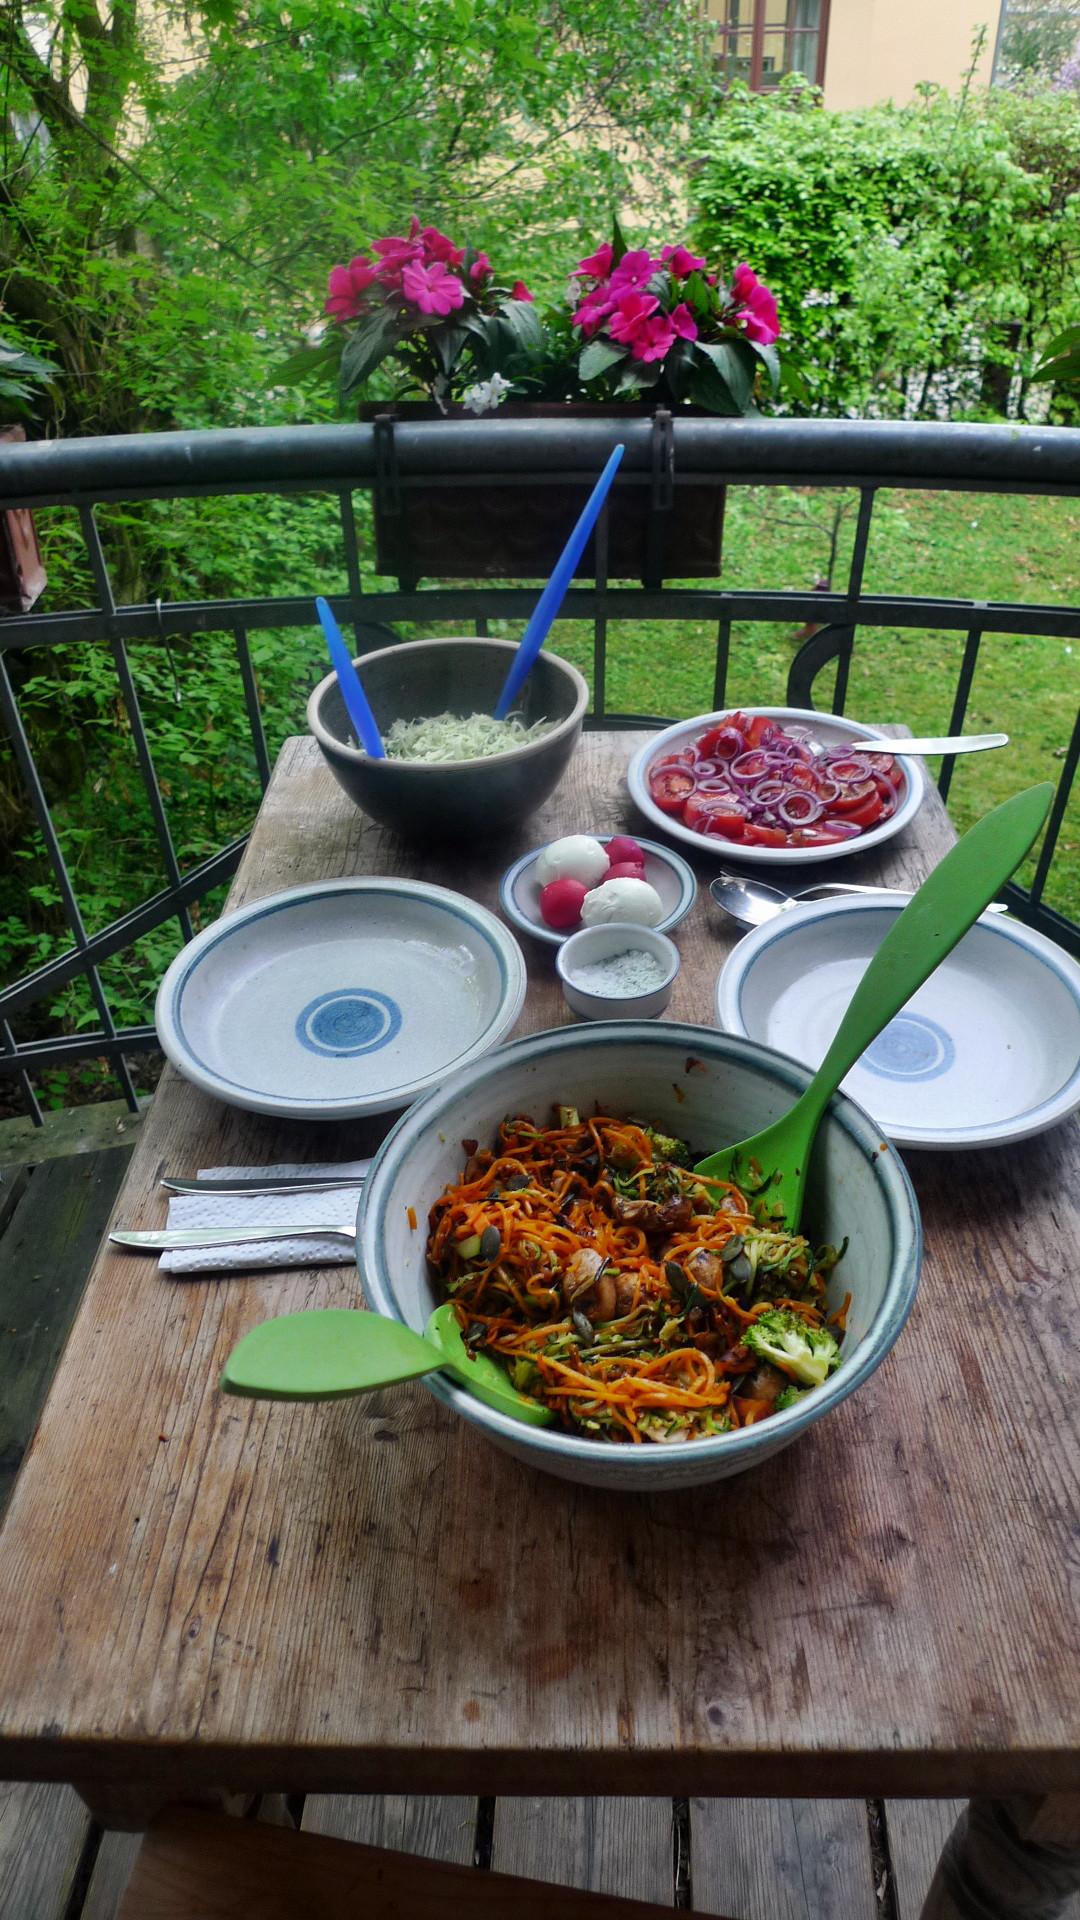 Gemüsespaghetti mit Champignon,Kohlrabisalat,Tomatensalat,vegan -5.5.15   (10)